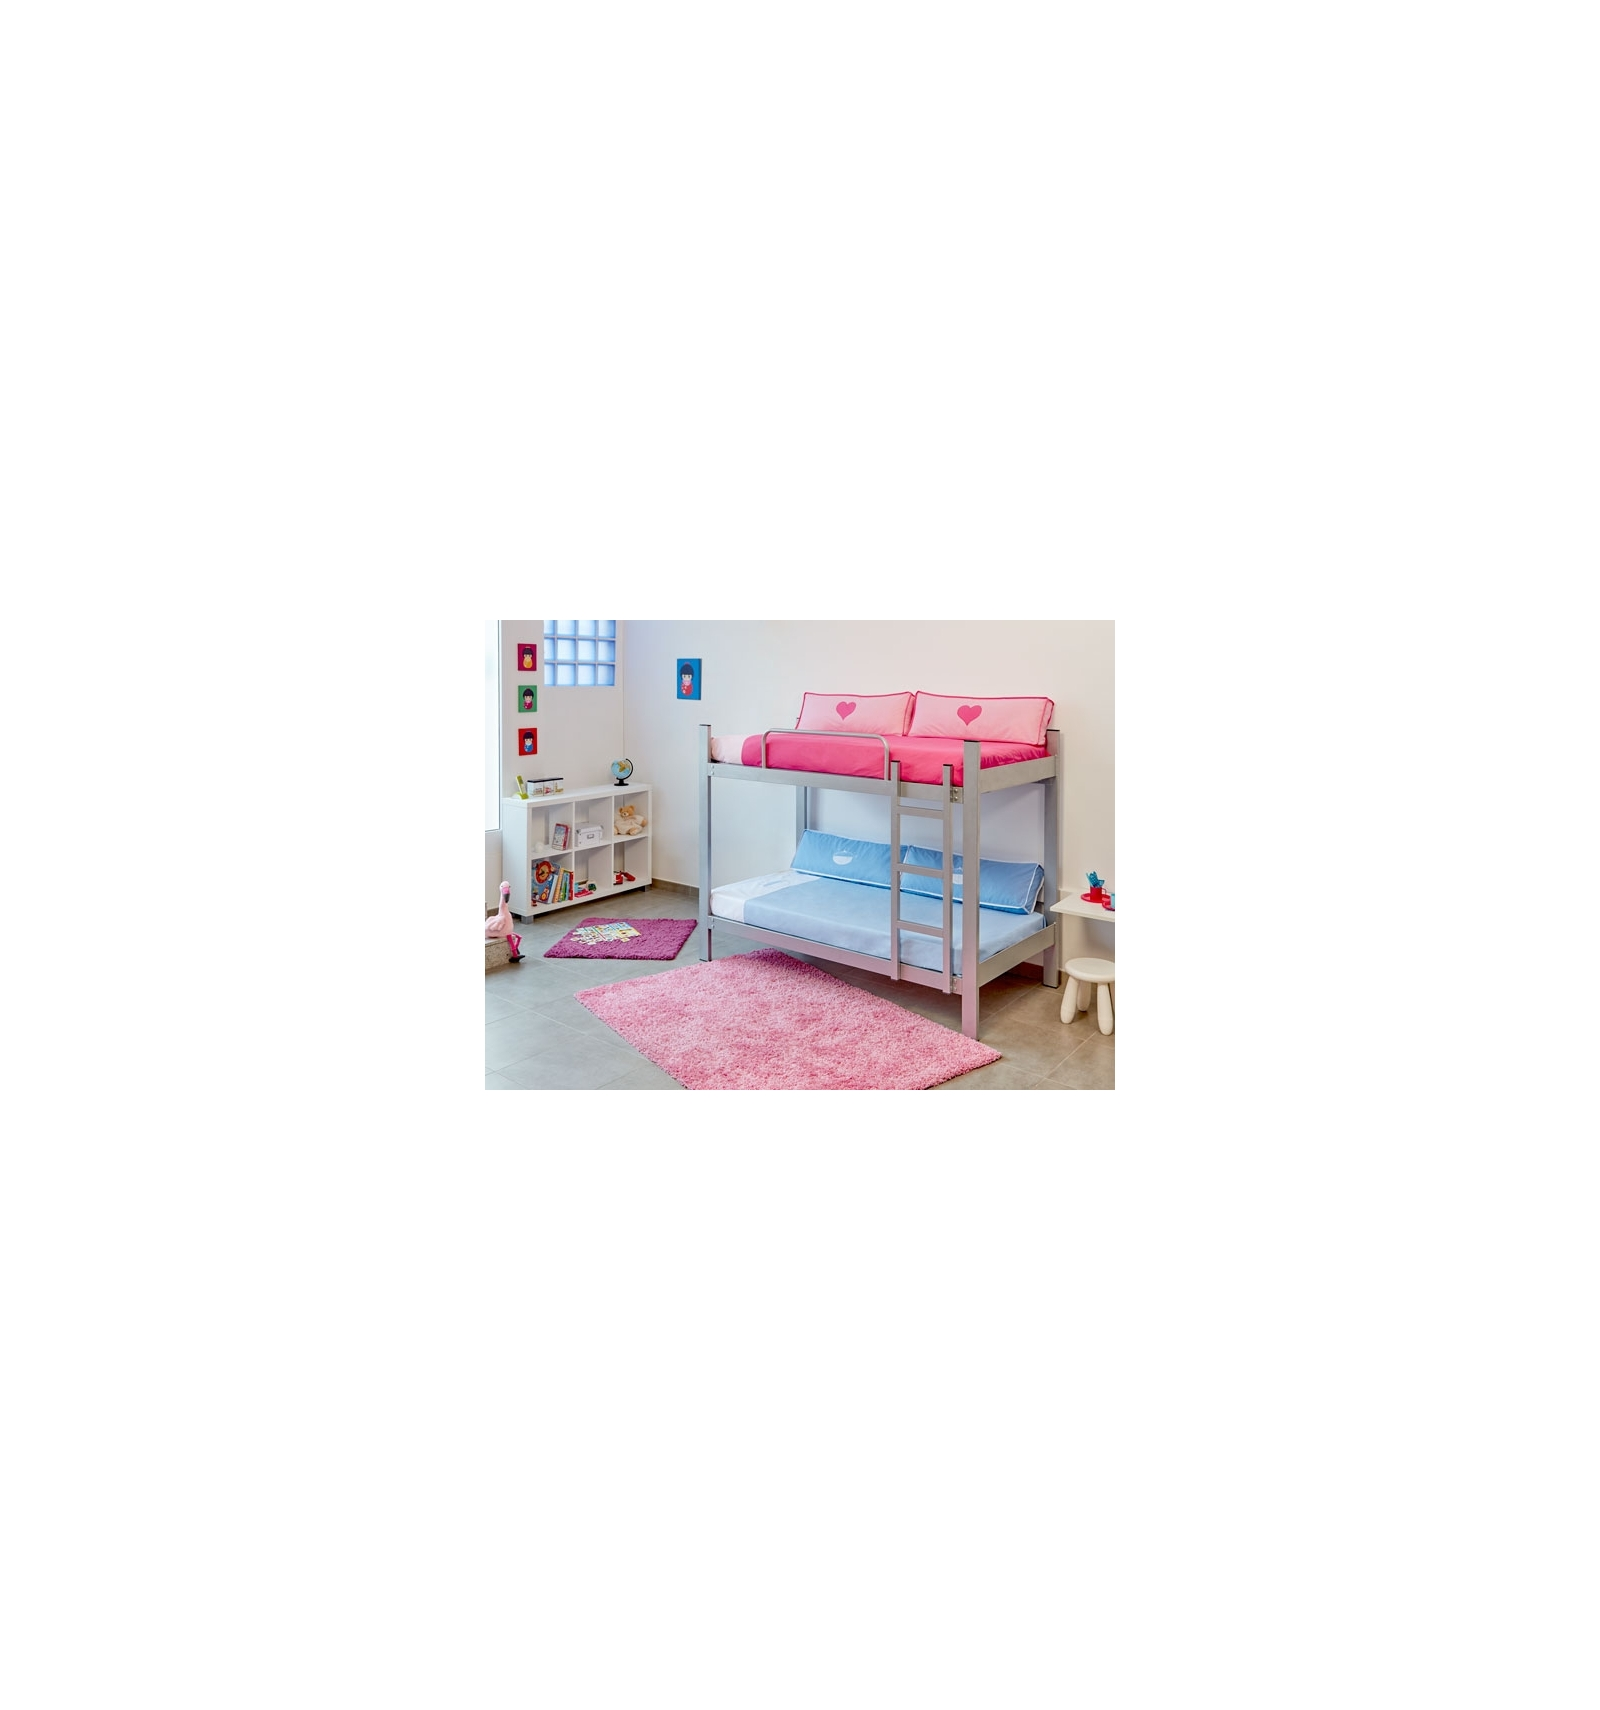 lit superpos m tallique. Black Bedroom Furniture Sets. Home Design Ideas